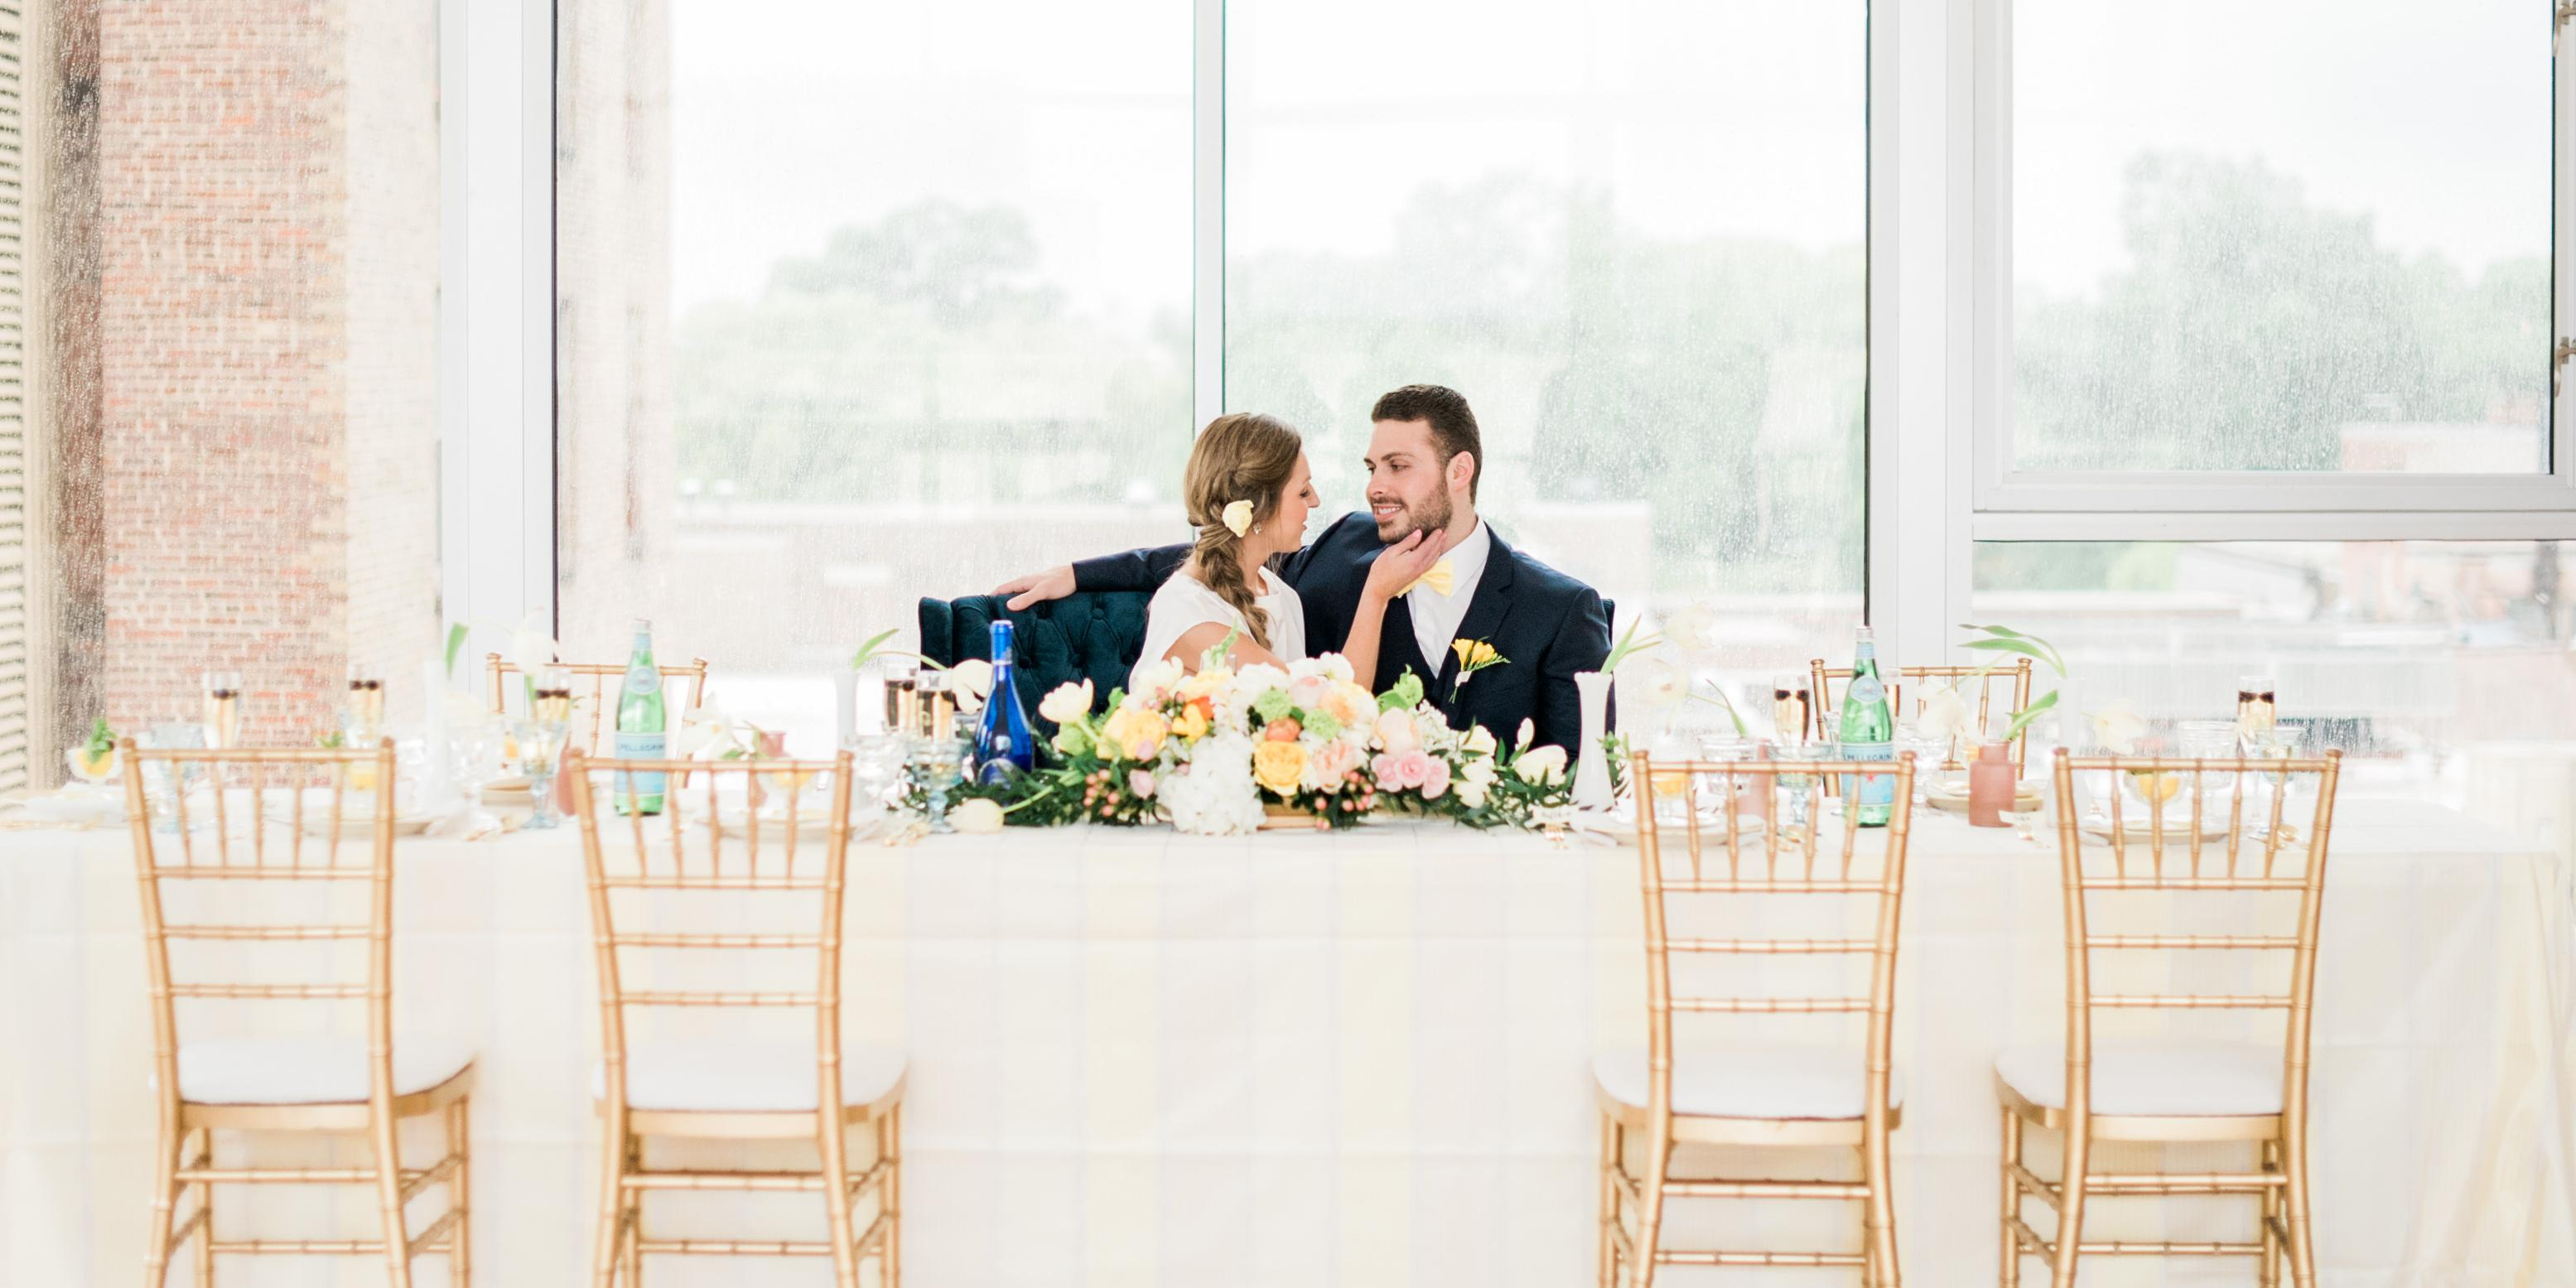 The Glass Box wedding Raleigh/Triangle